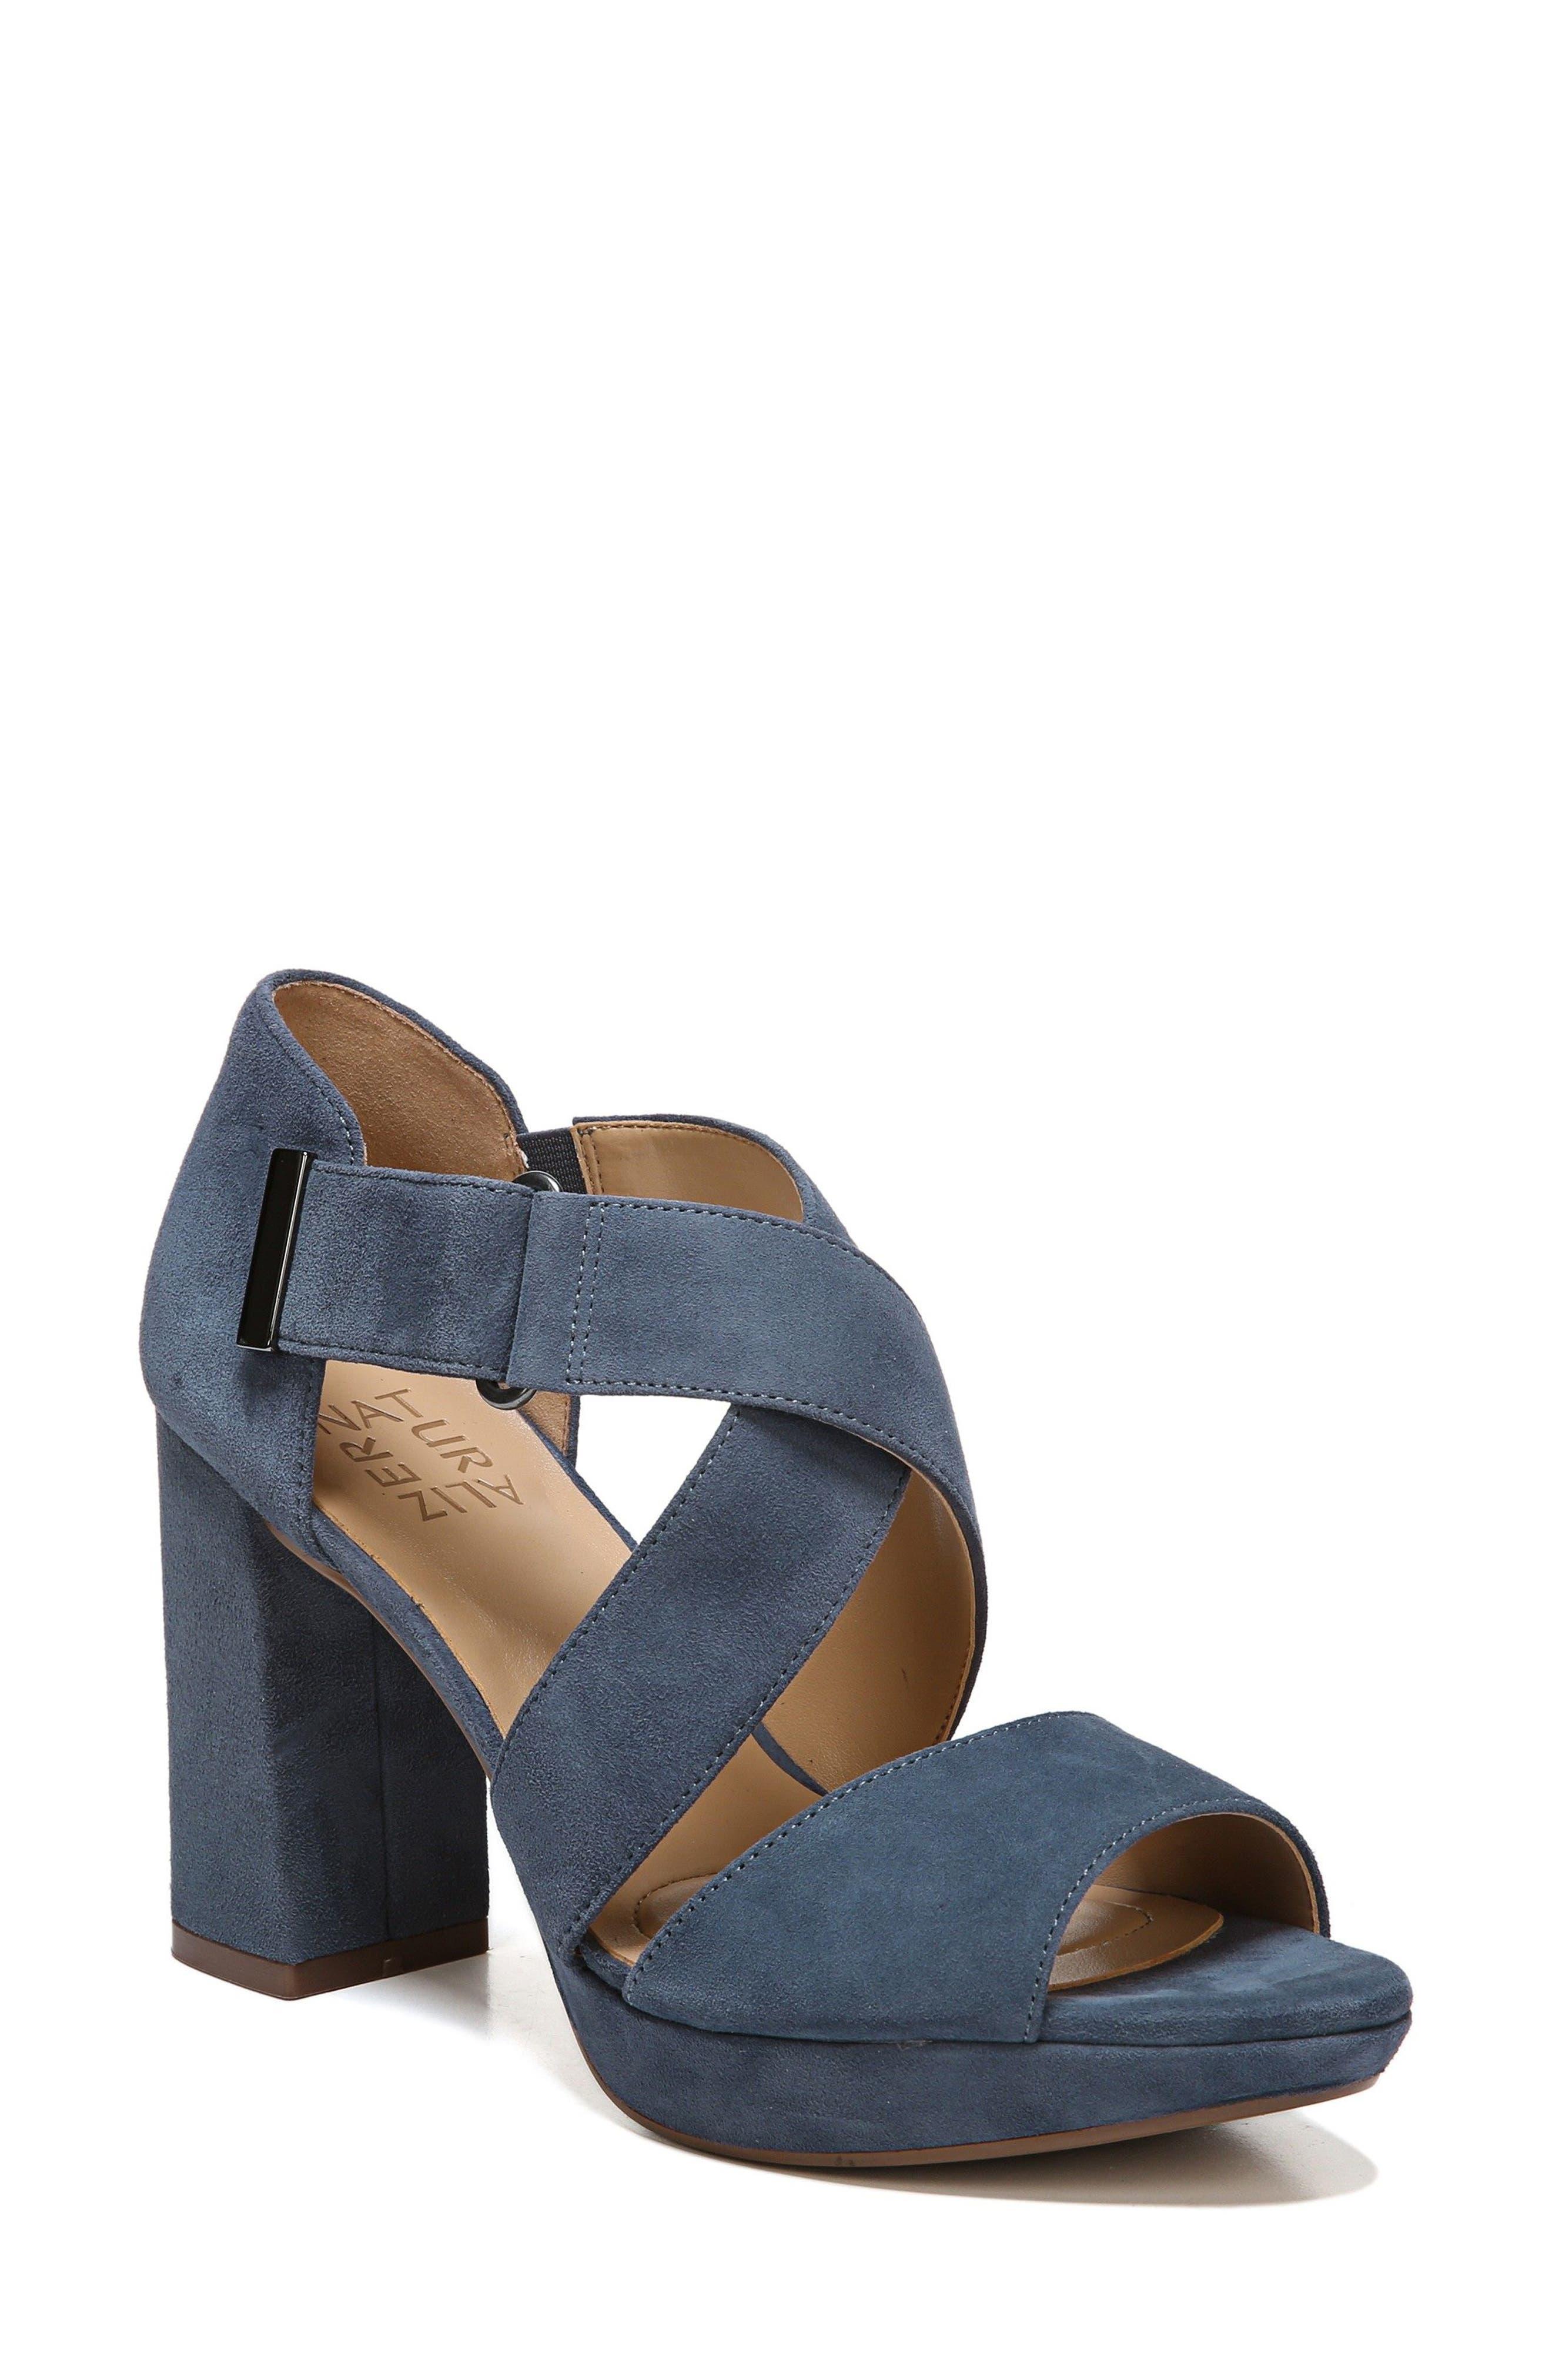 Alternate Image 1 Selected - Naturalizer Harper Platform Sandal (Women)